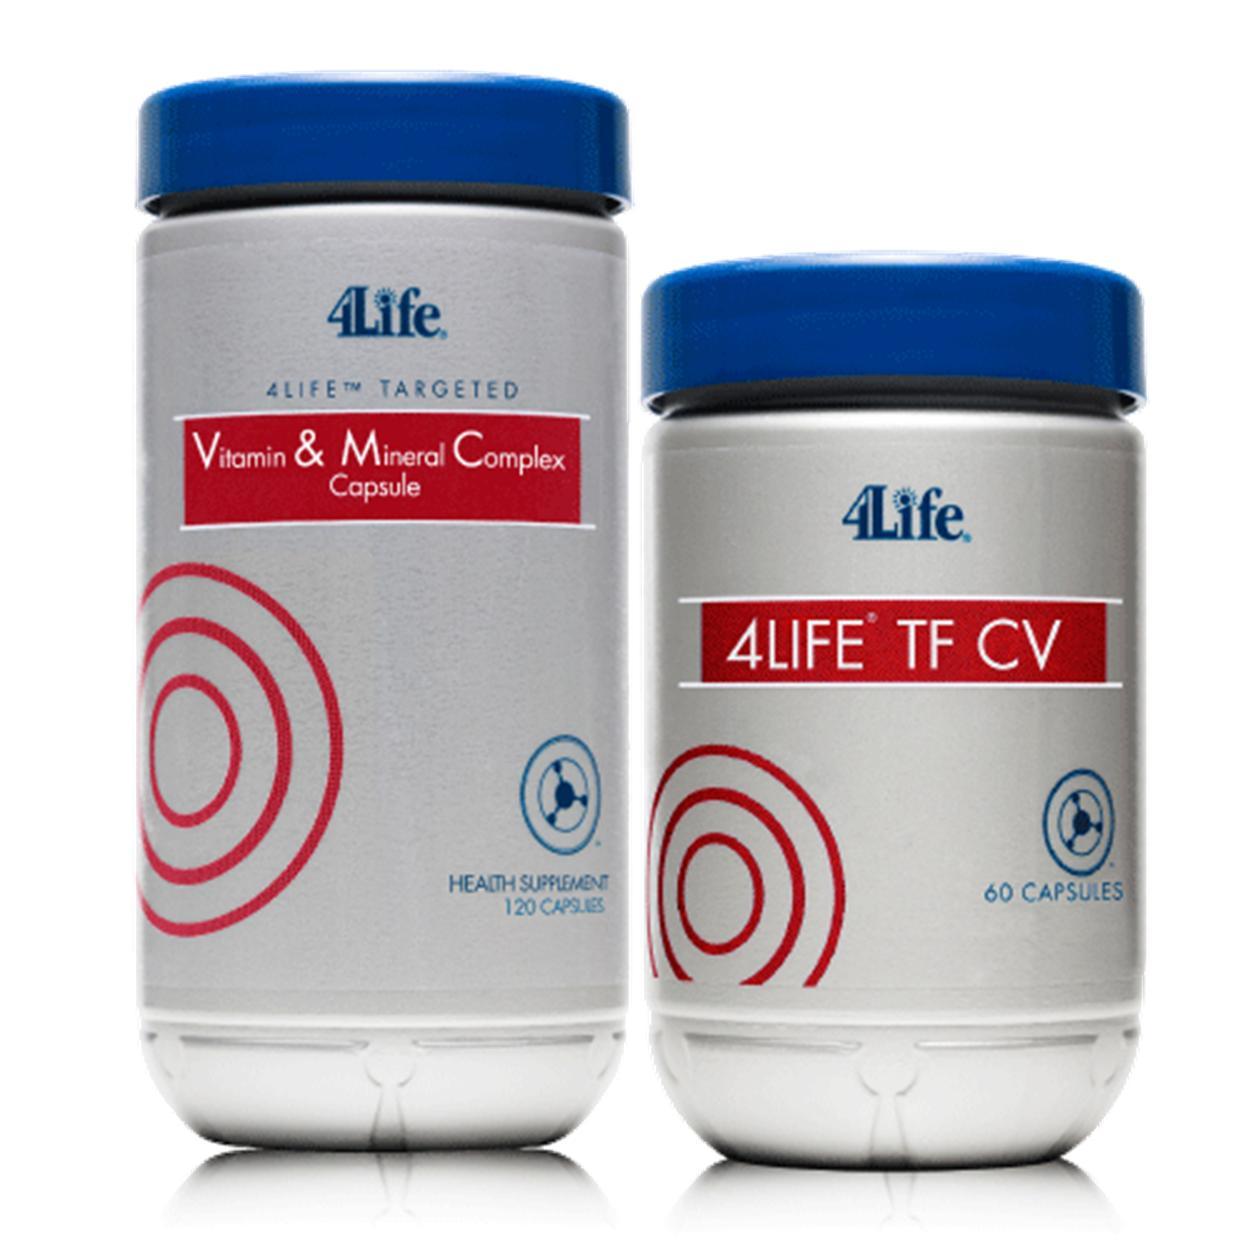 TF CV + Targeted Vitamin & Mineral Complex